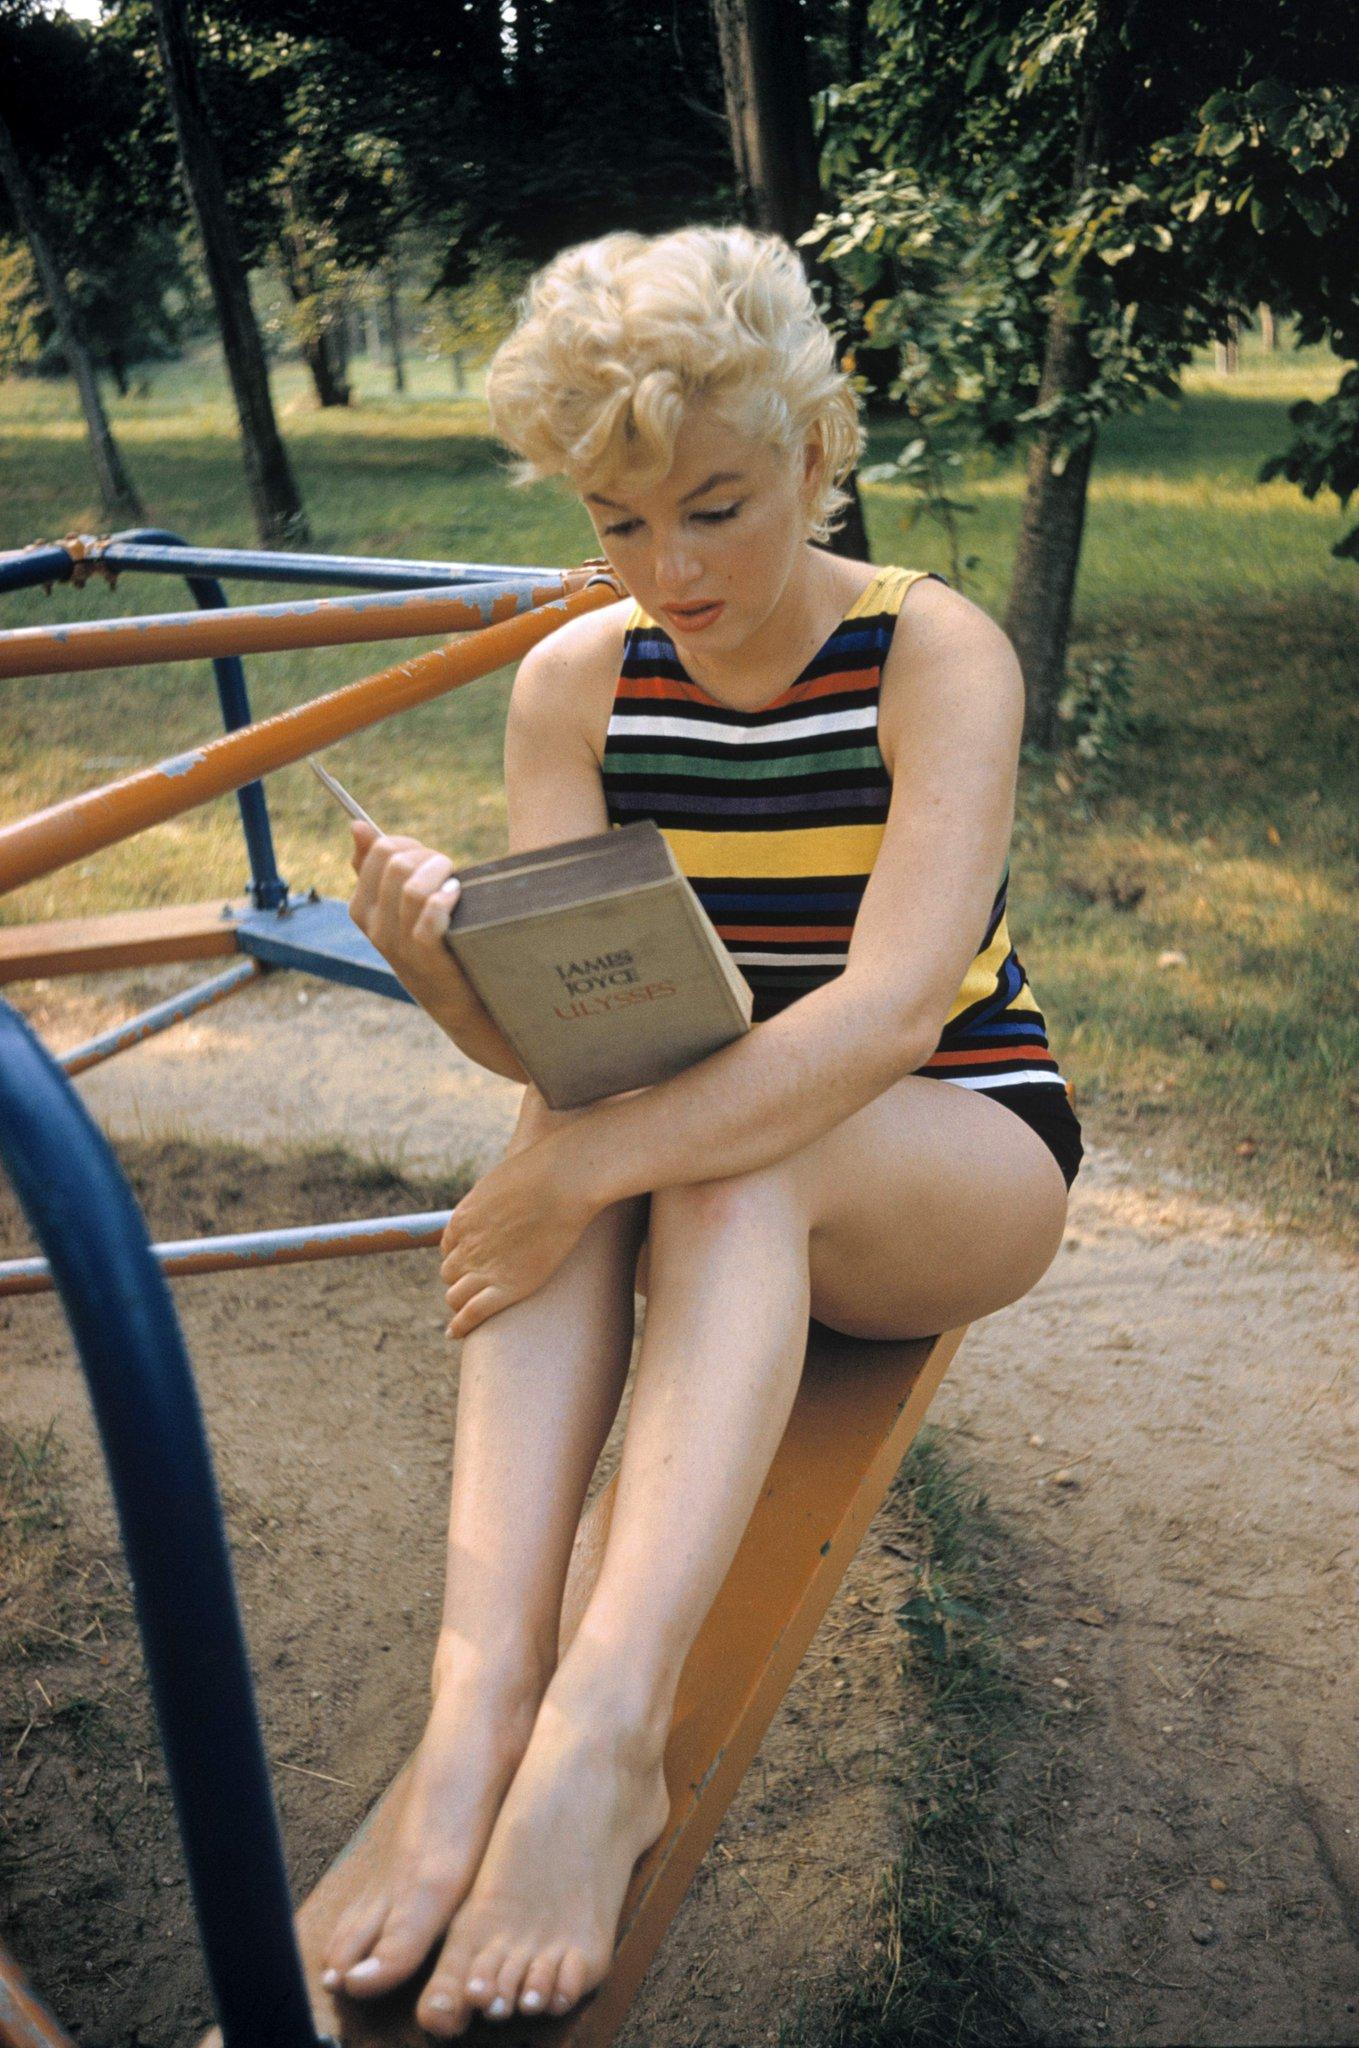 Marilyn Monroe reading Ulysses by James Joyce.   #InternationalLiteracyDay  © #EveArnold/#MagnumPhotos https://t.co/tHX8D1AYyh